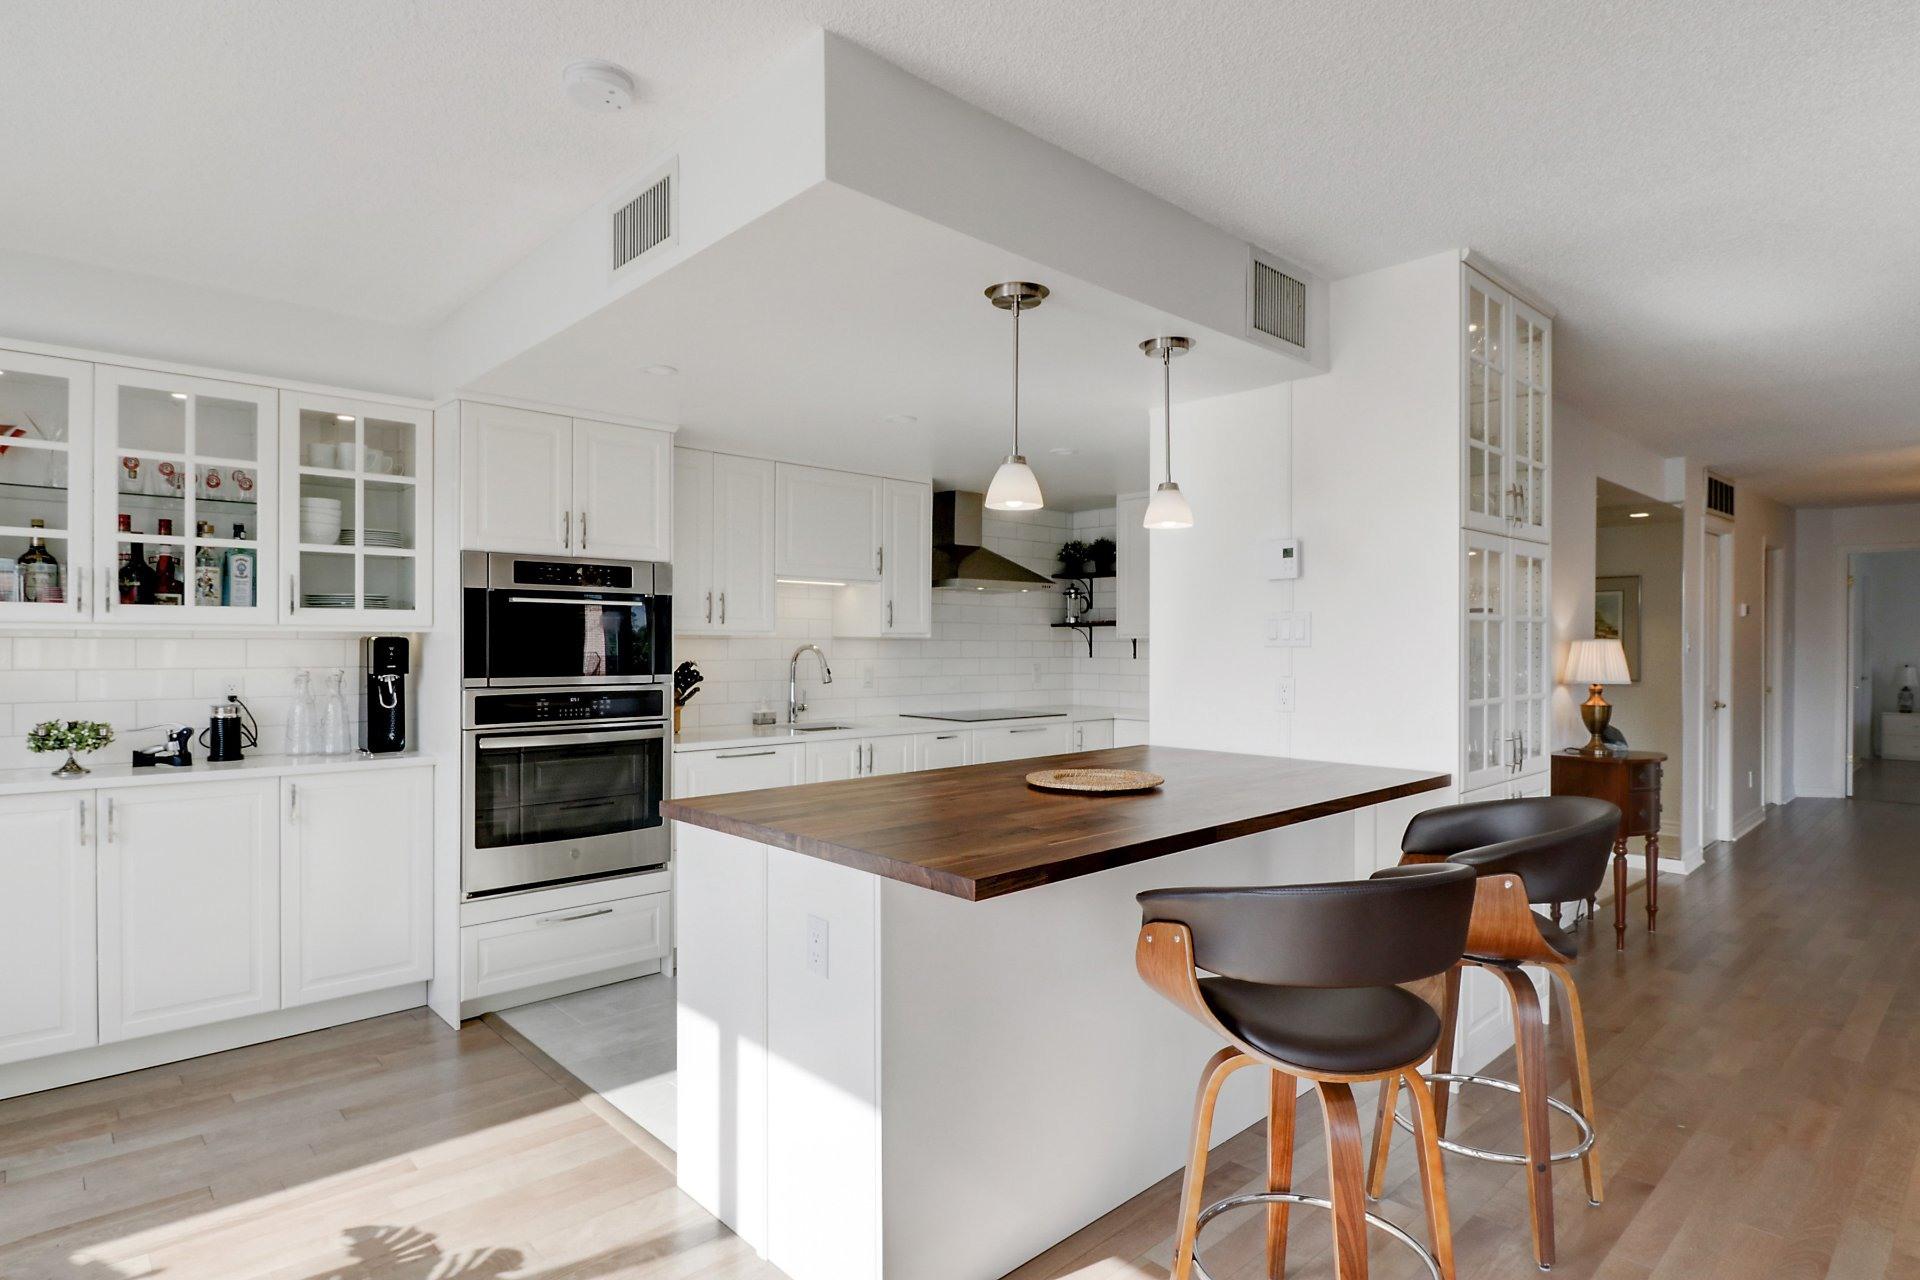 image 5 - Apartment For sale Beloeil - 9 rooms